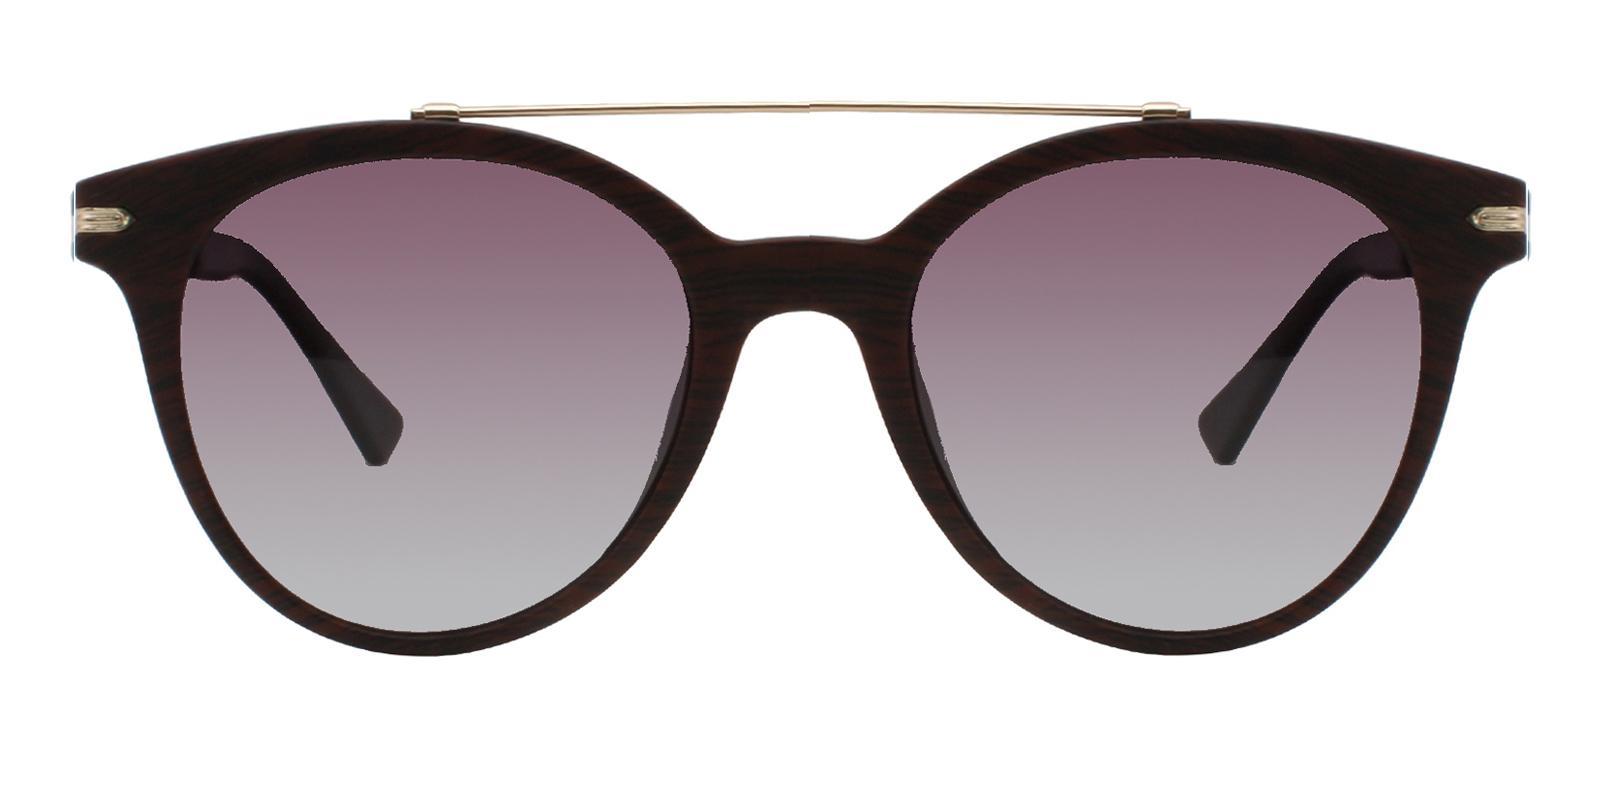 Aria Brown Metal , Combination , TR UniversalBridgeFit , Sunglasses Frames from ABBE Glasses